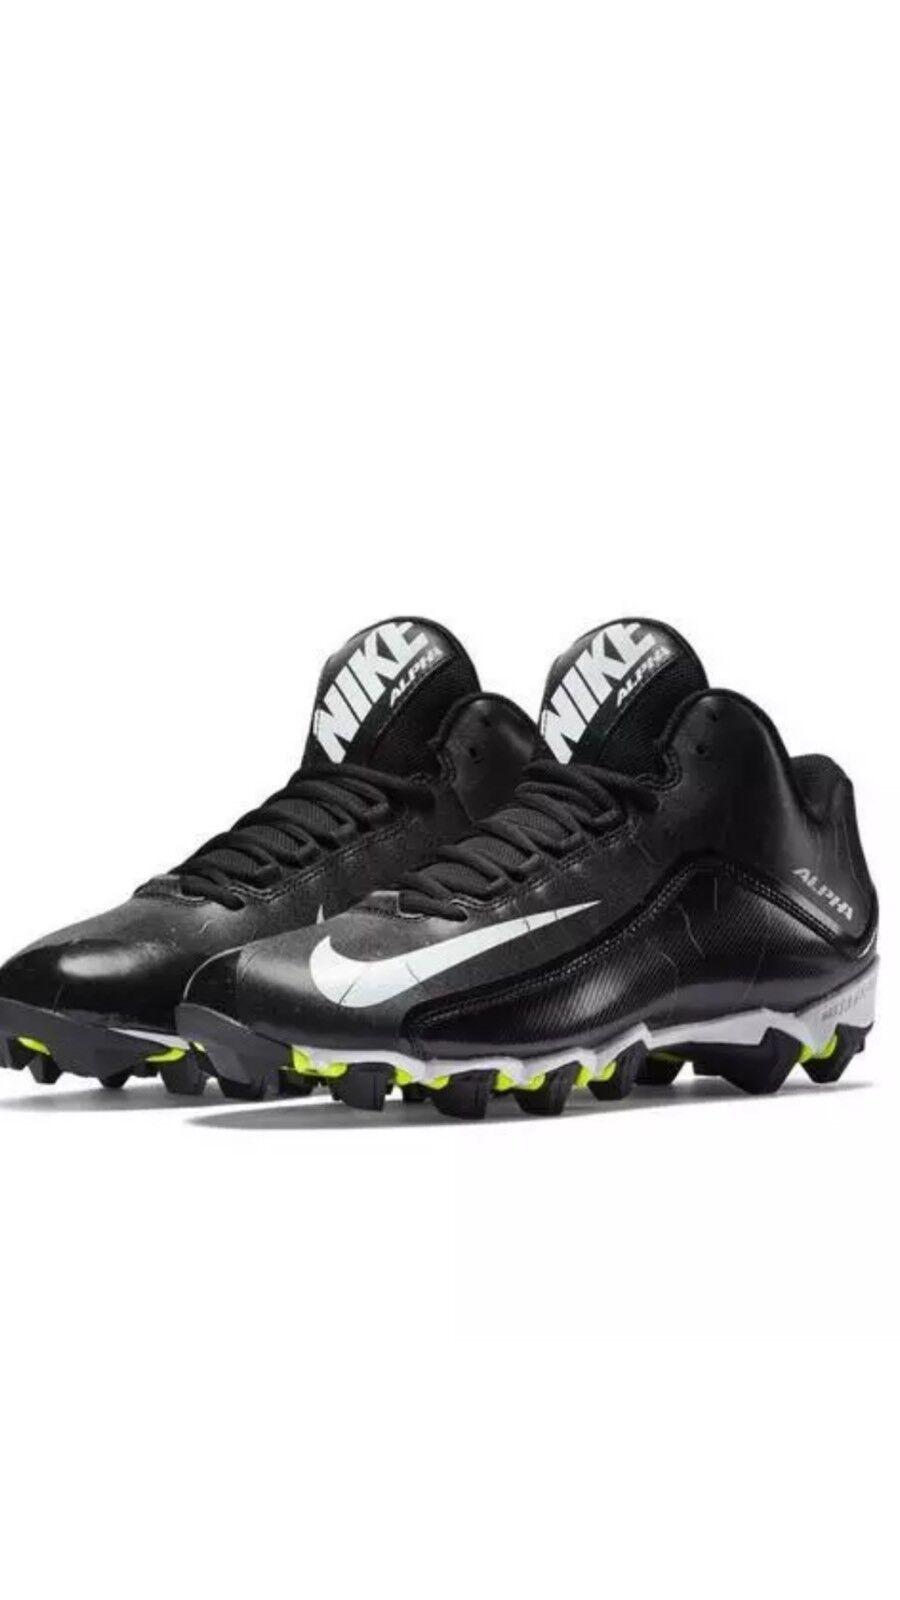 Nike Alpha football cleats size 11.5 black Seasonal price cuts, discount benefits